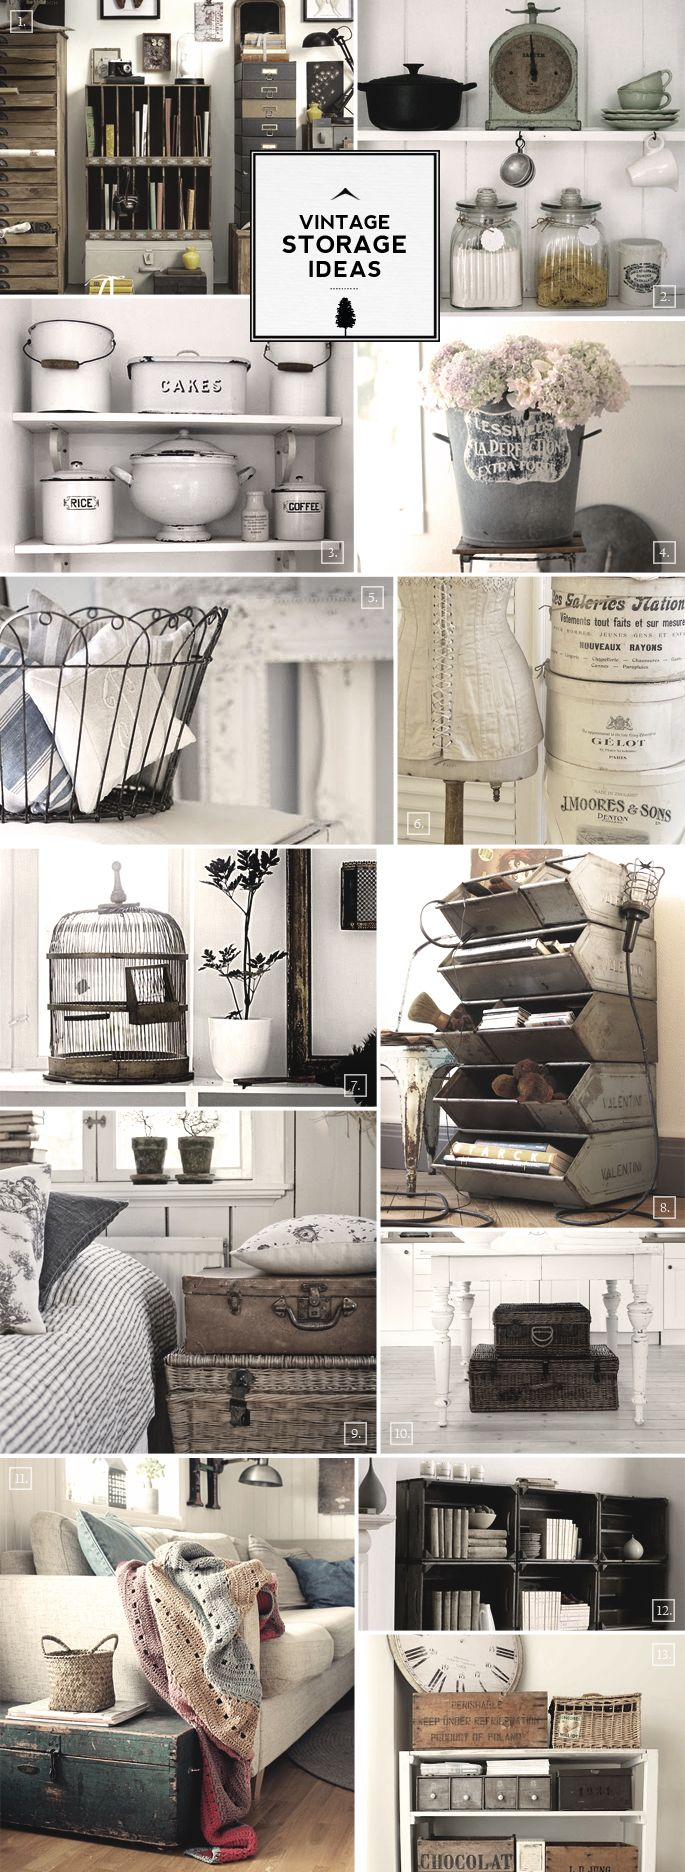 Diy Rustic Vintage Farmhouse Storage Ideas Home